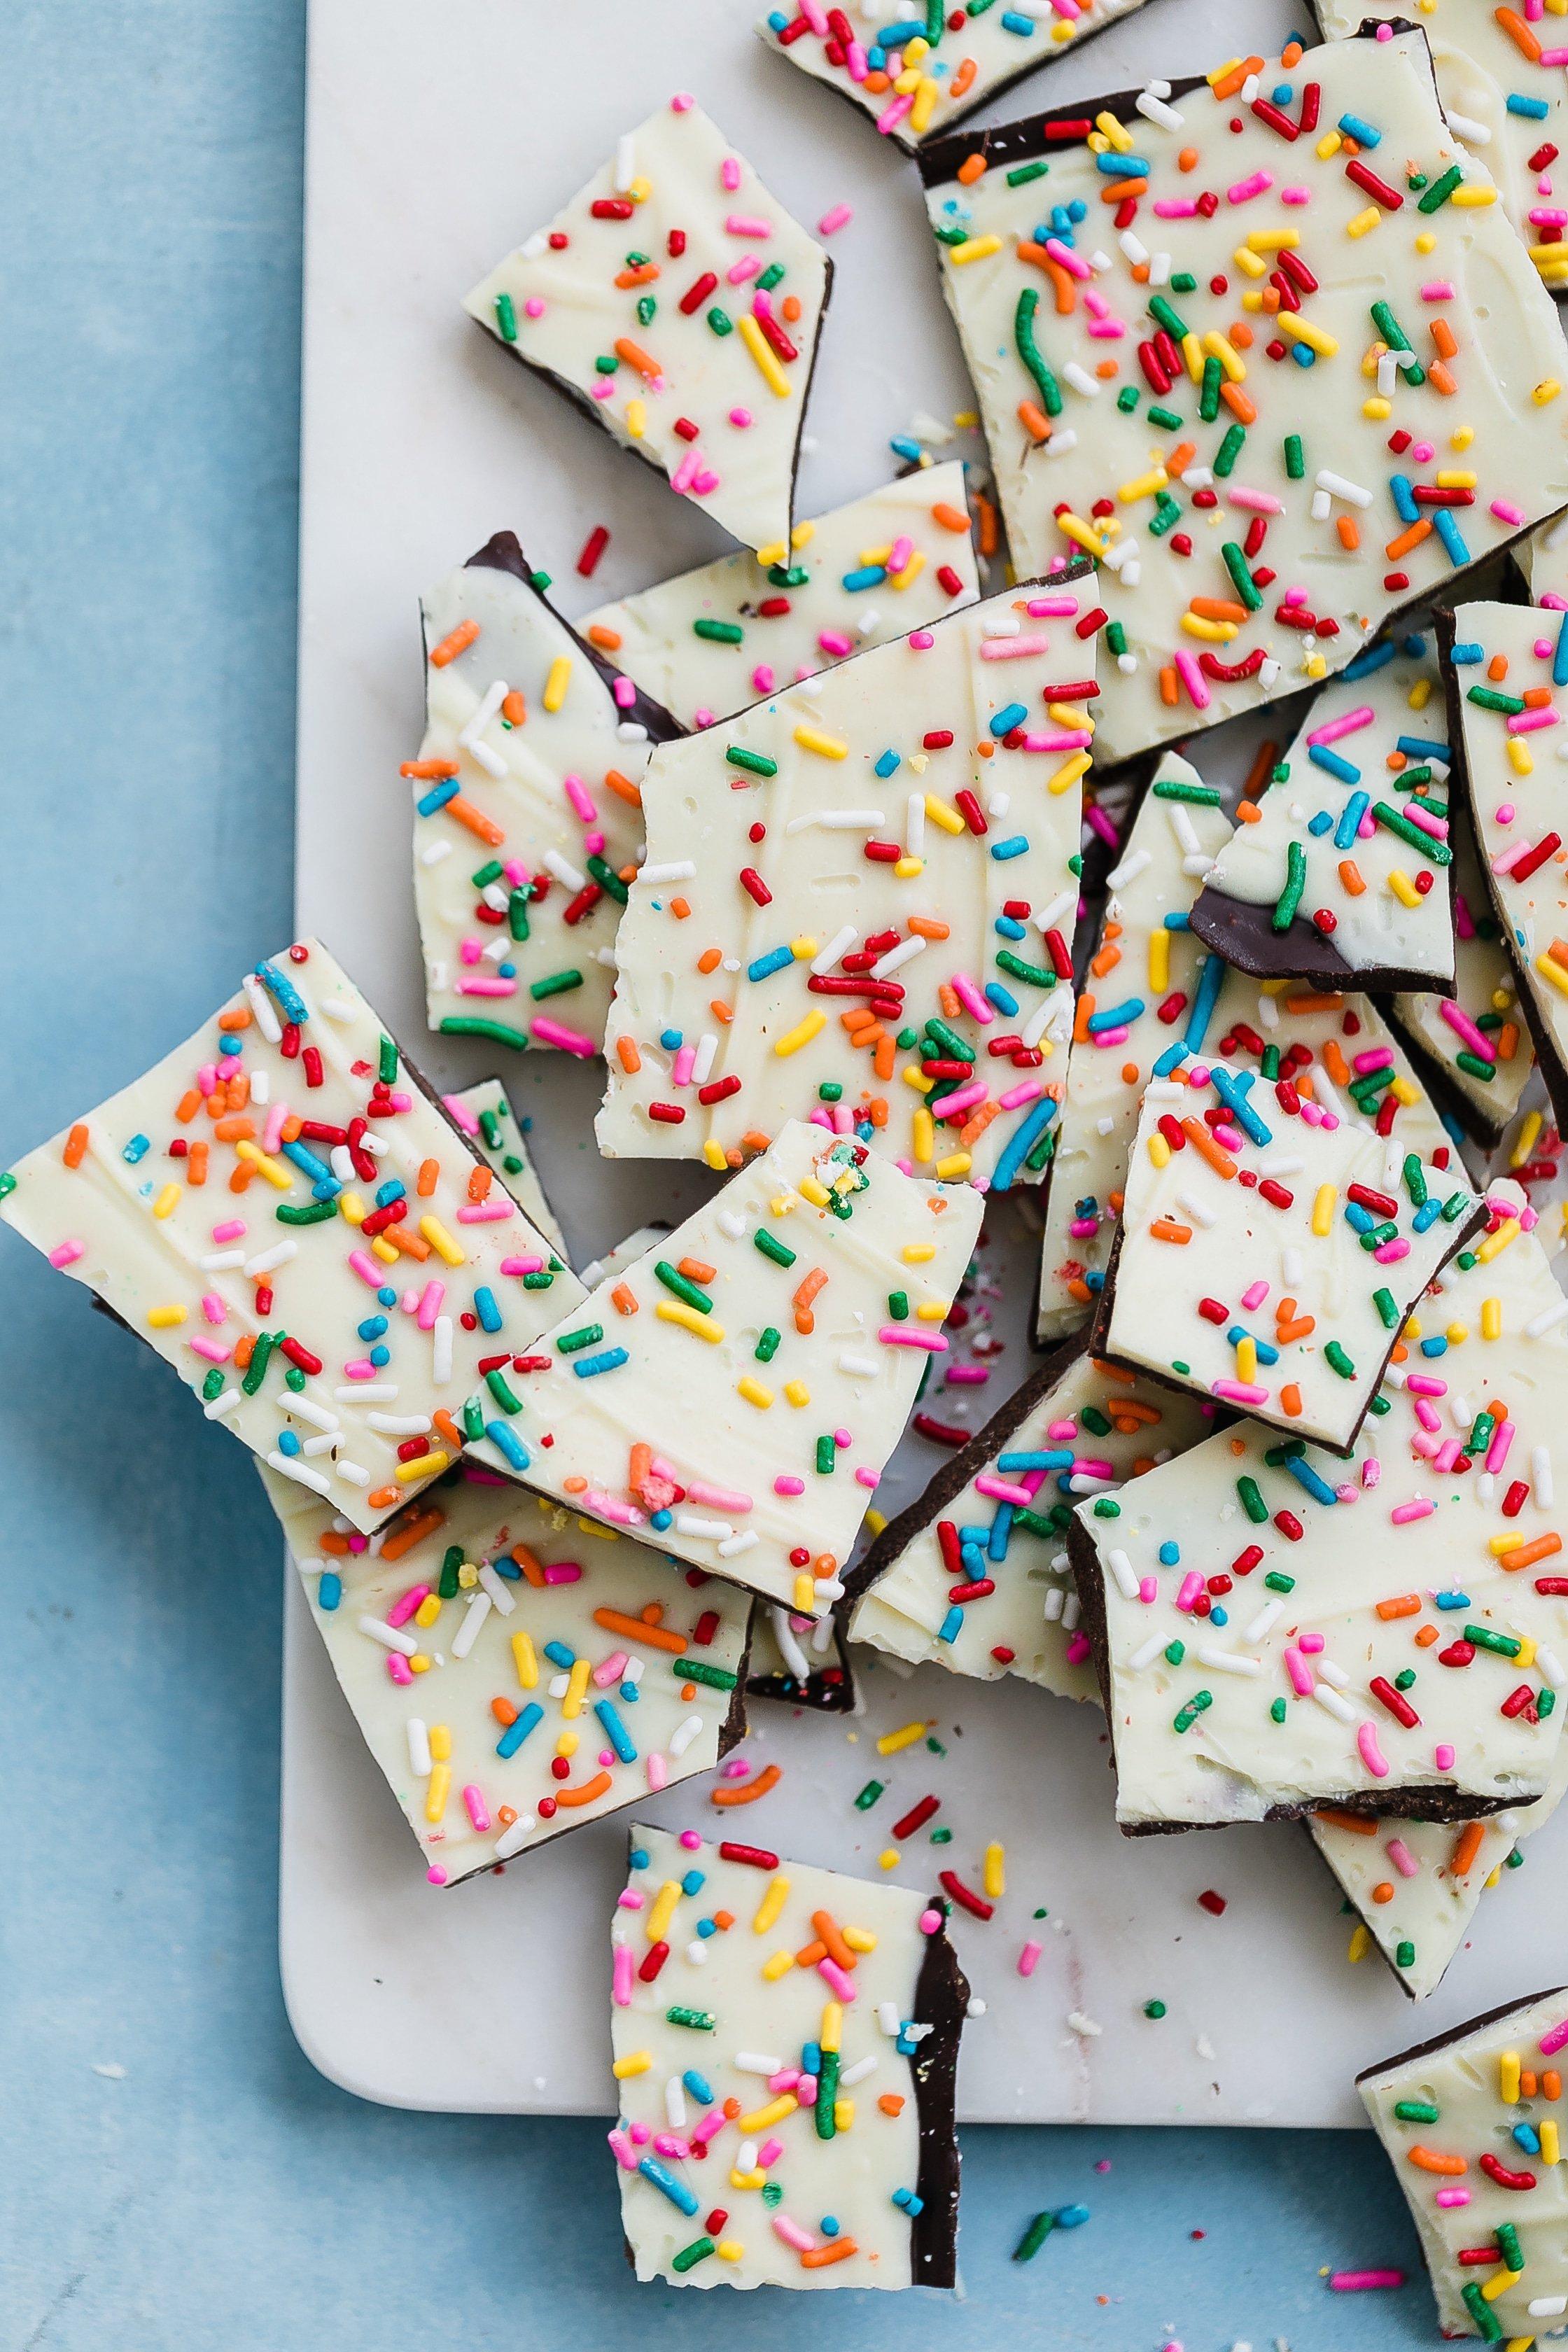 cake batter chocolate bark I howsweeteats.com #cakebatter #chocolate #bark #desserts #christmas